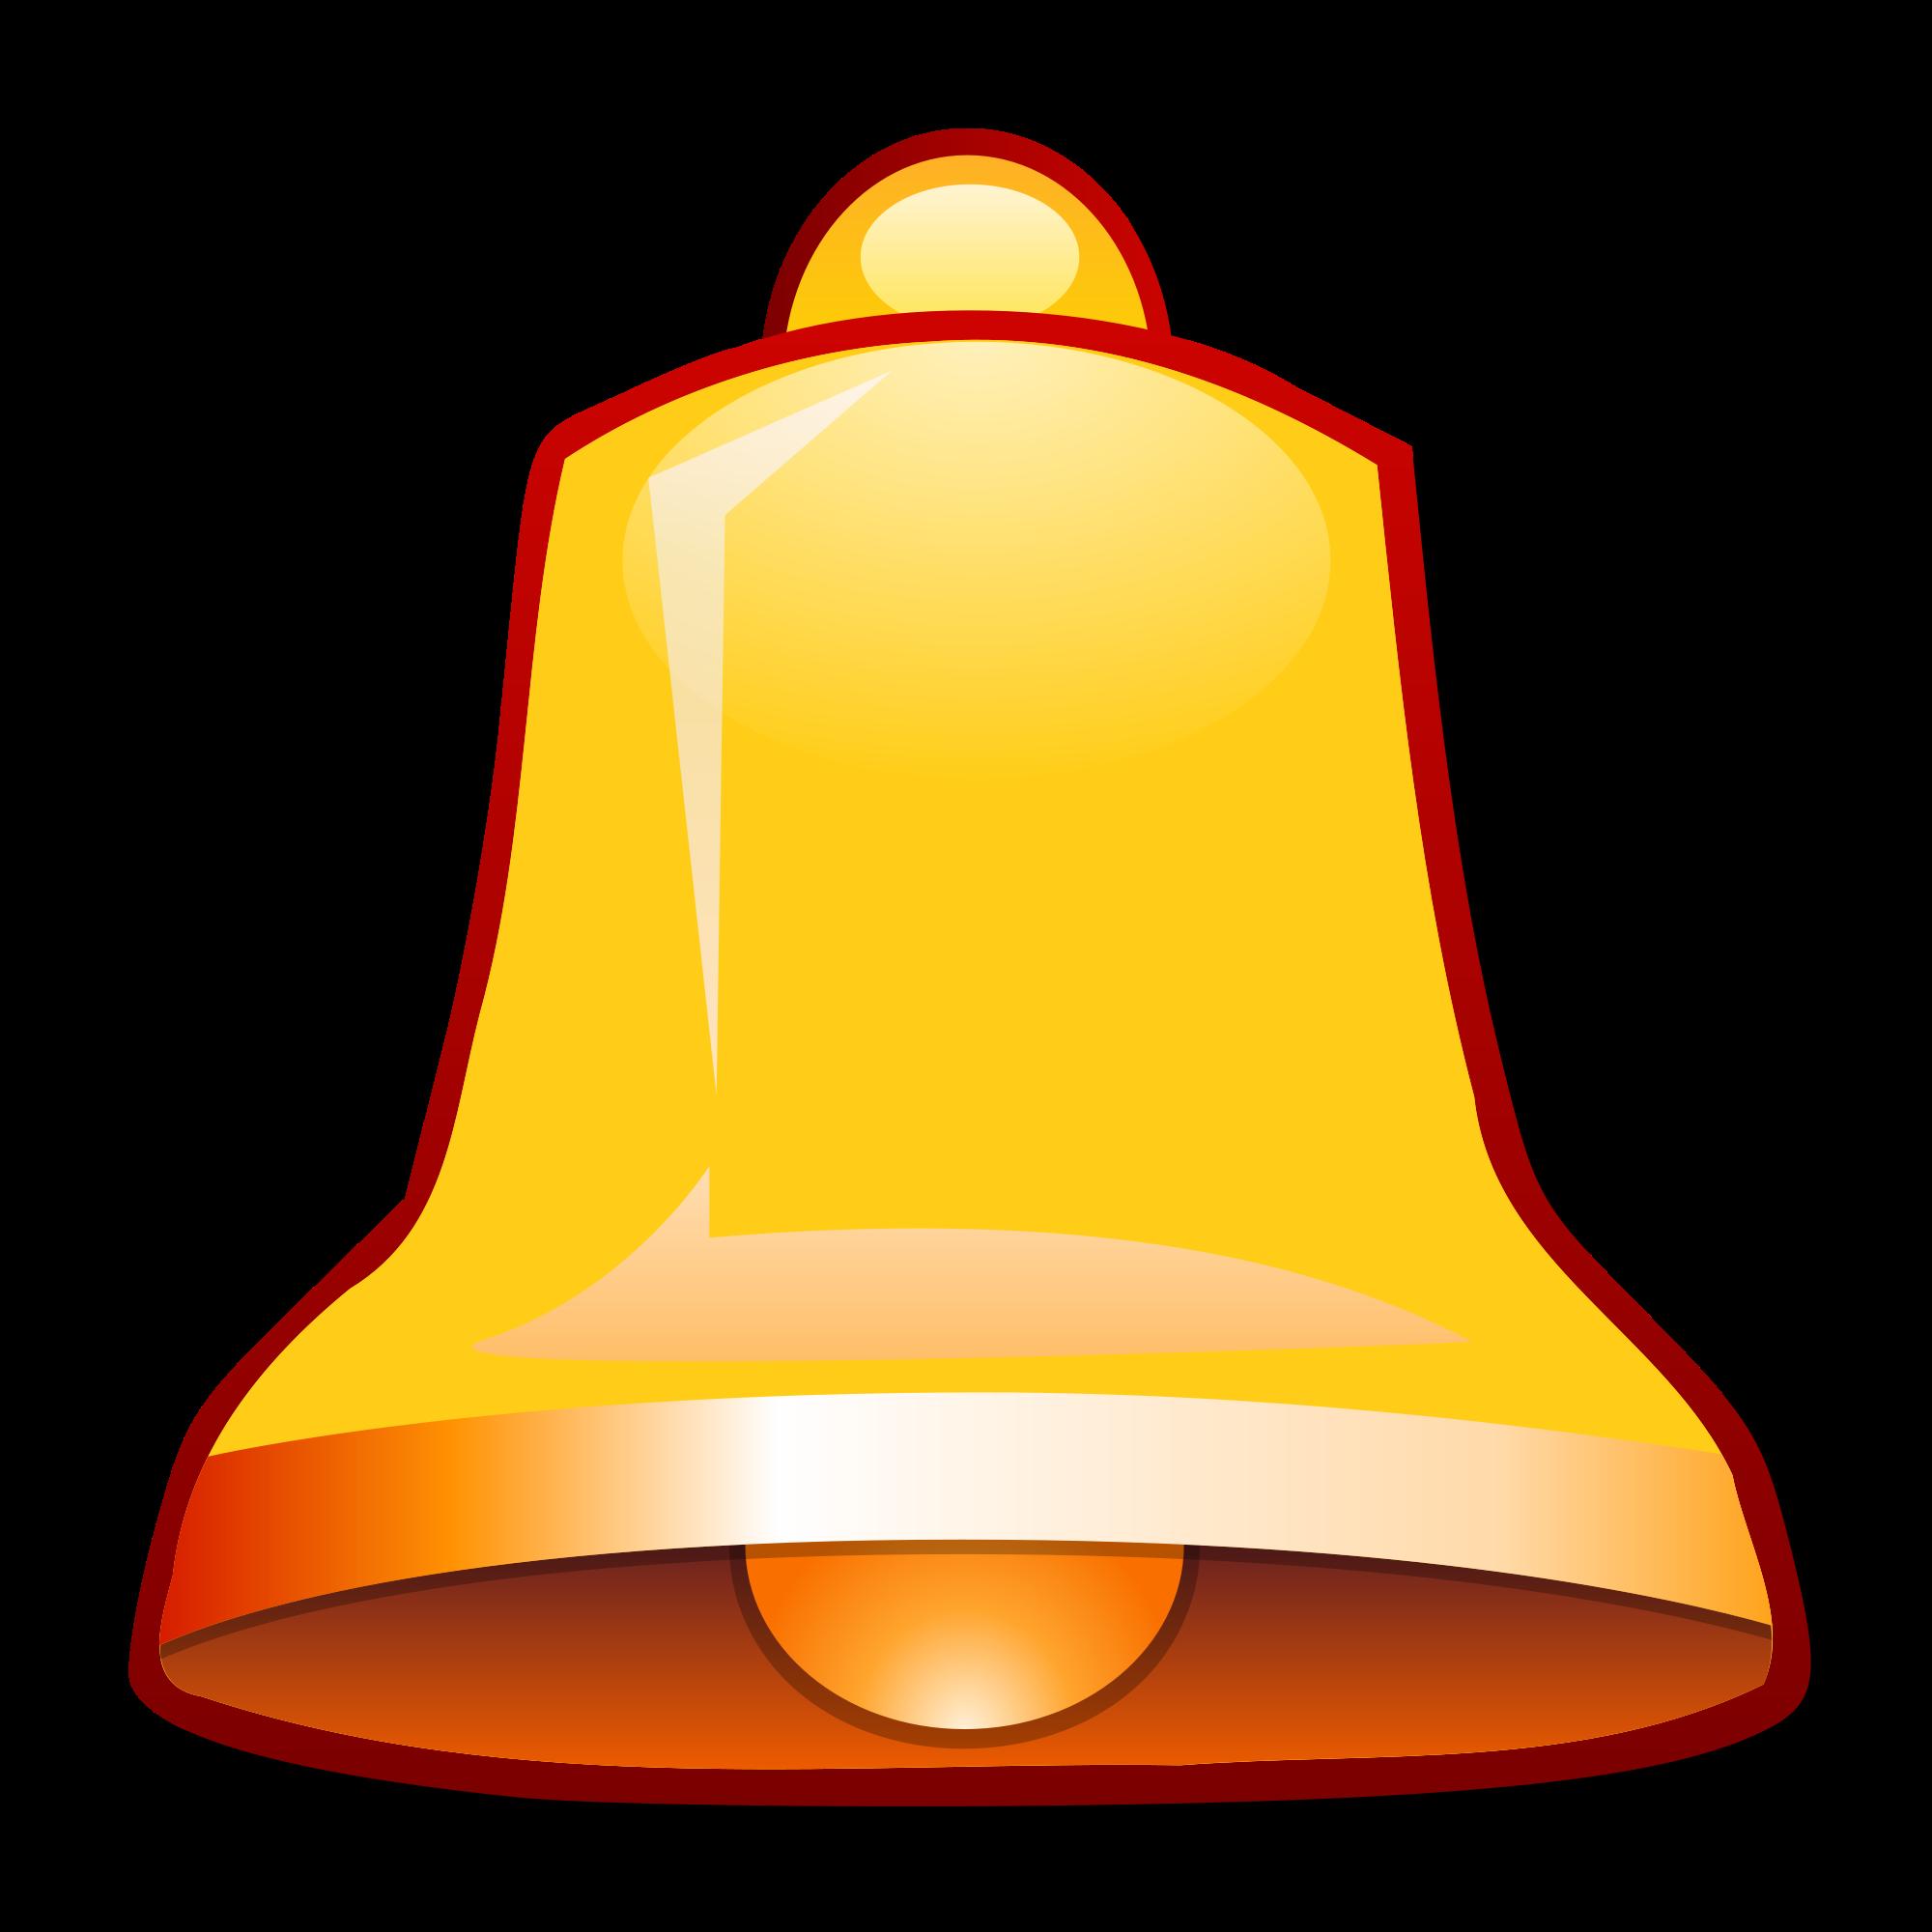 2000x2000 School Bell Clip Art 3